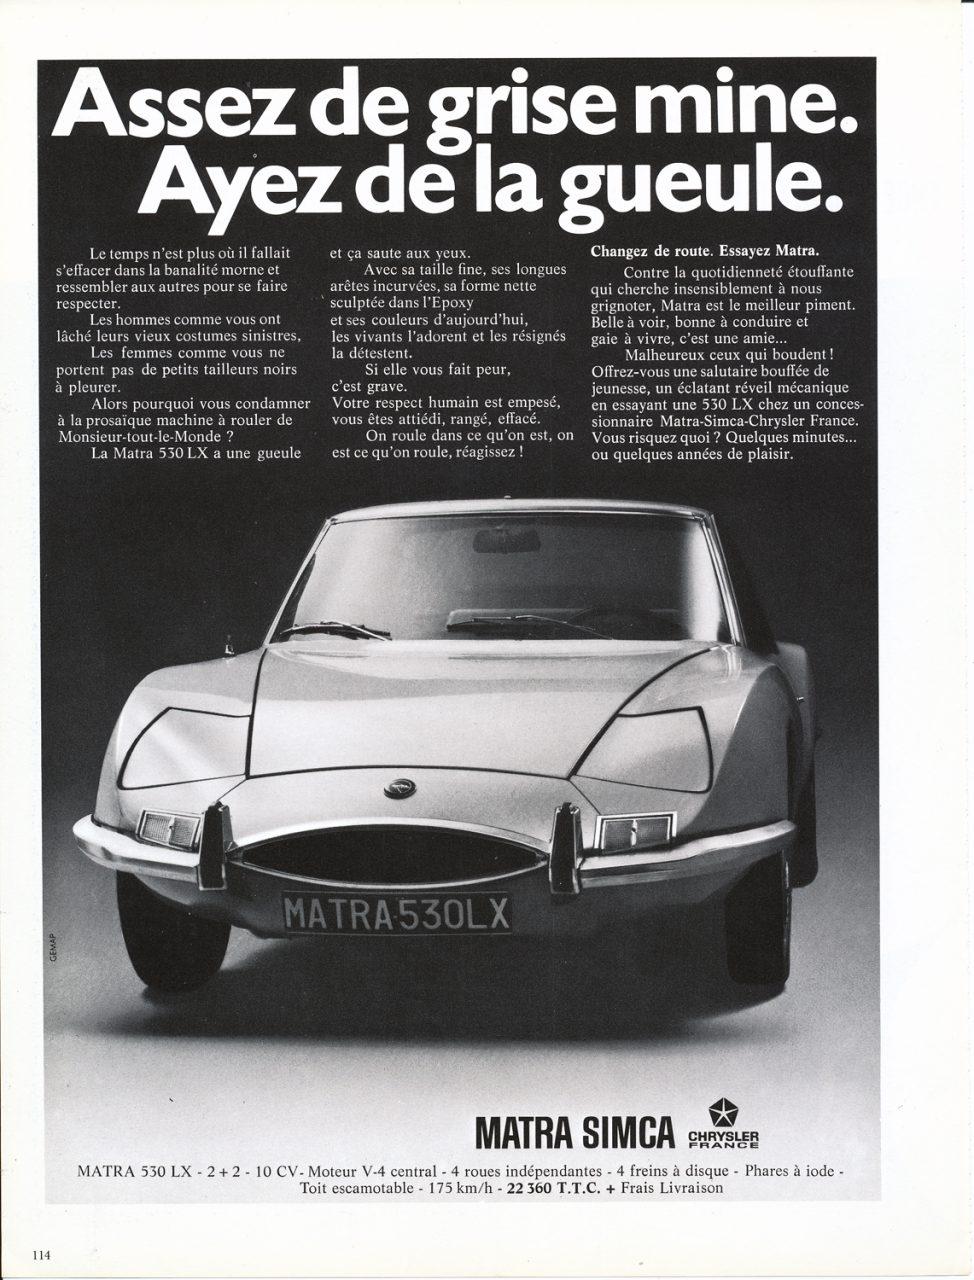 MATRA 530 LX, Advertisement, Connaissance des arts